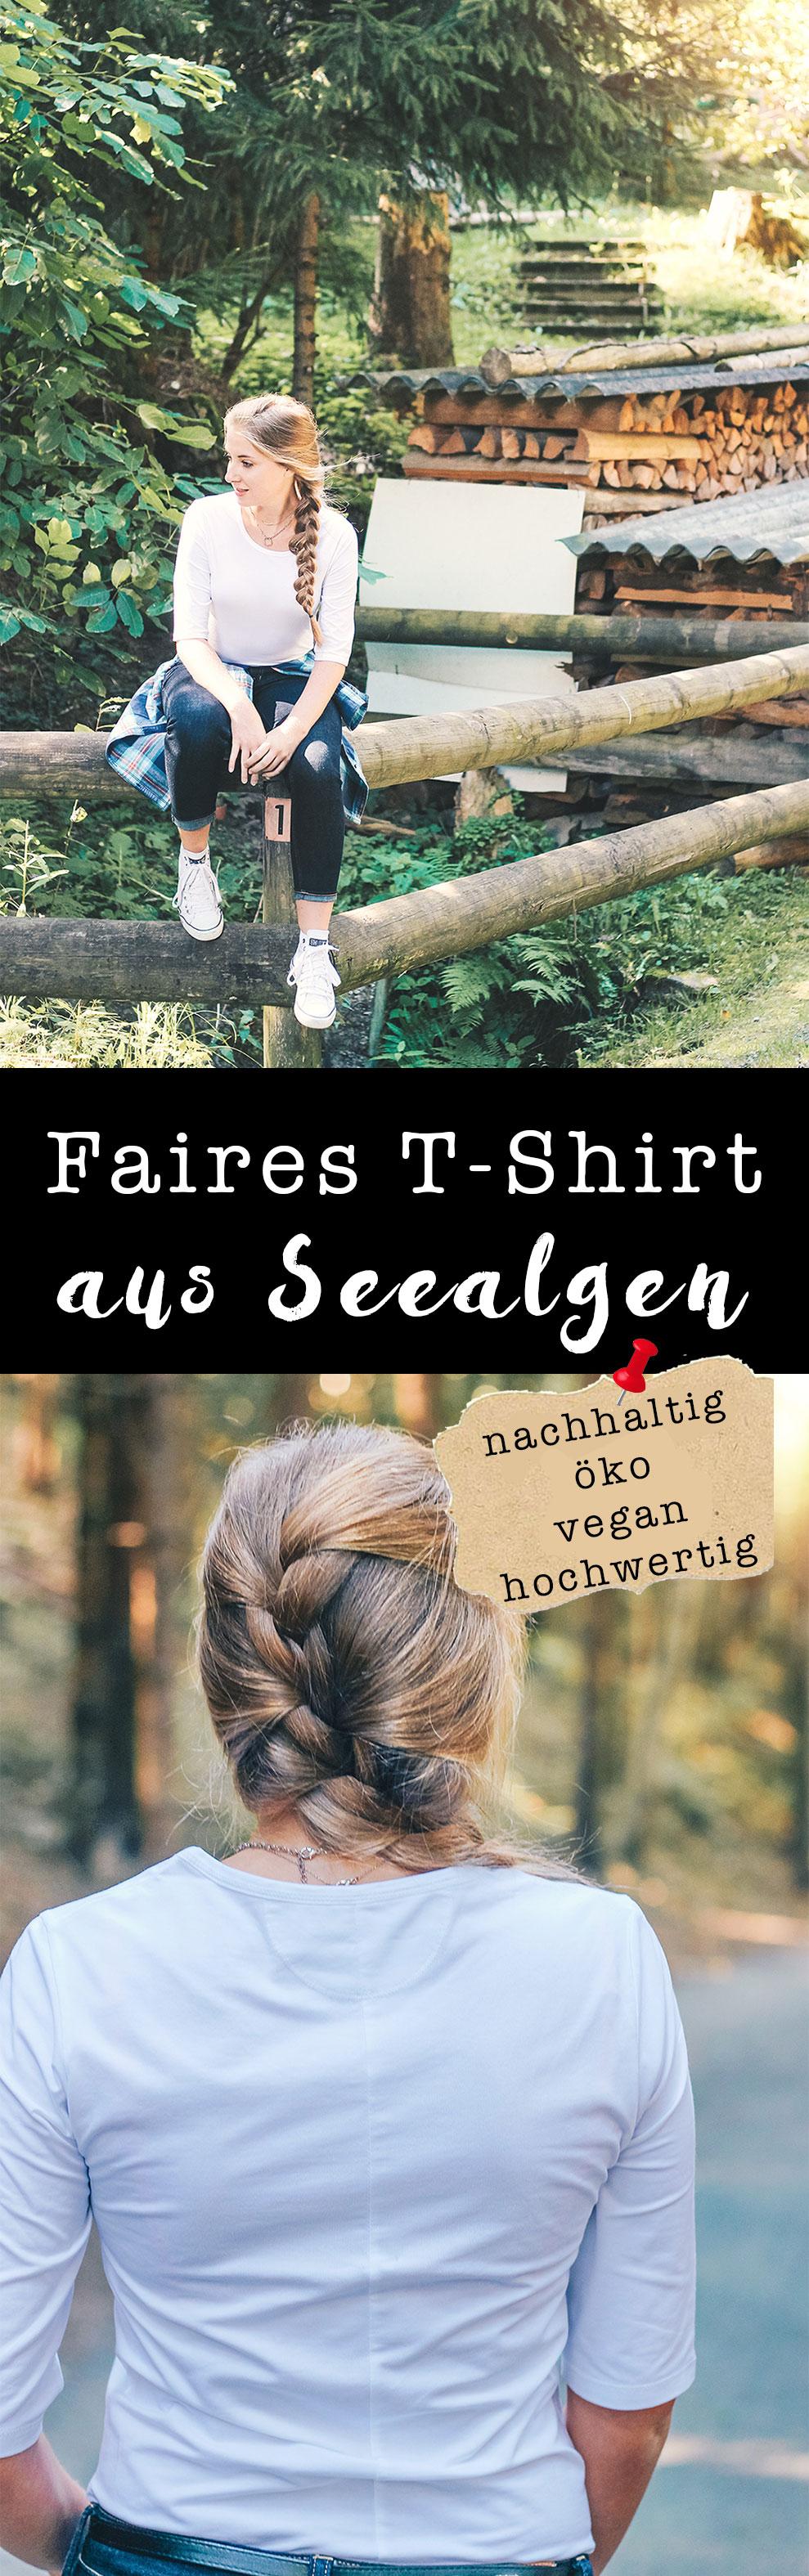 Faires-T-Shirt, Funktionsschnitt, Biomode, Fair Fashion